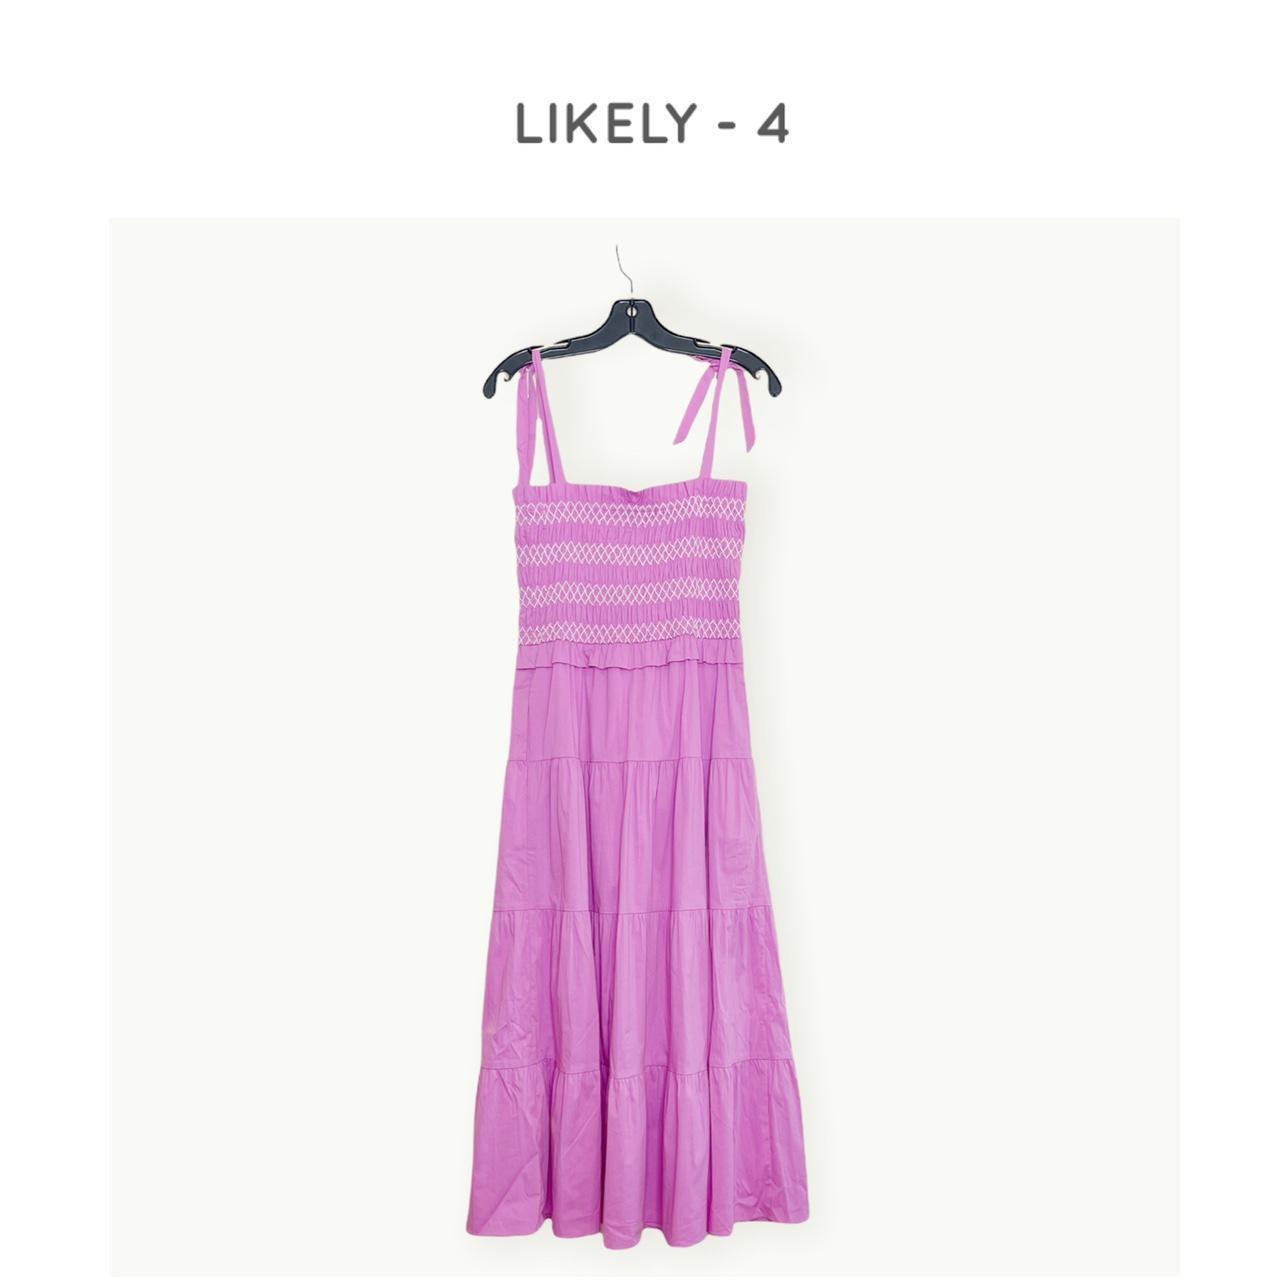 Product Image 1 - LIKELY Delfina Midi Dress  - New